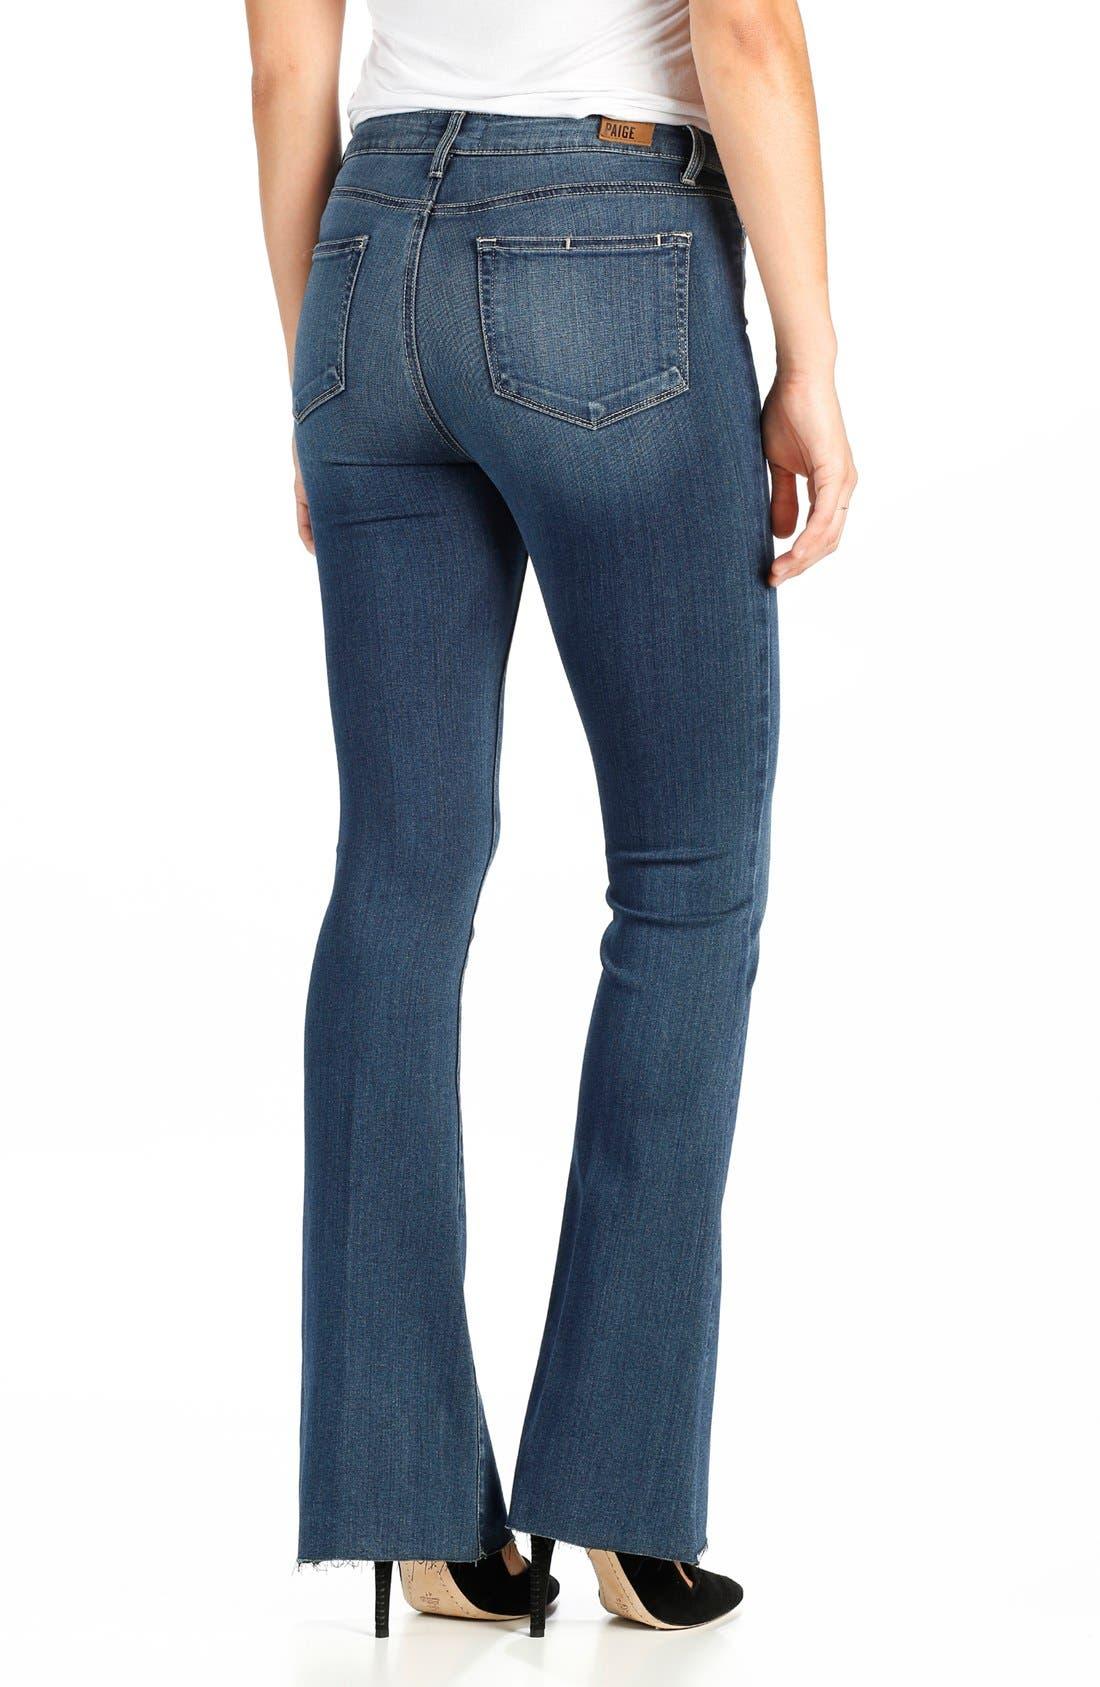 Alternate Image 2  - PAIGE Transcend - Bell Canyon High Waist Raw Hem Flare Jeans (Giona)